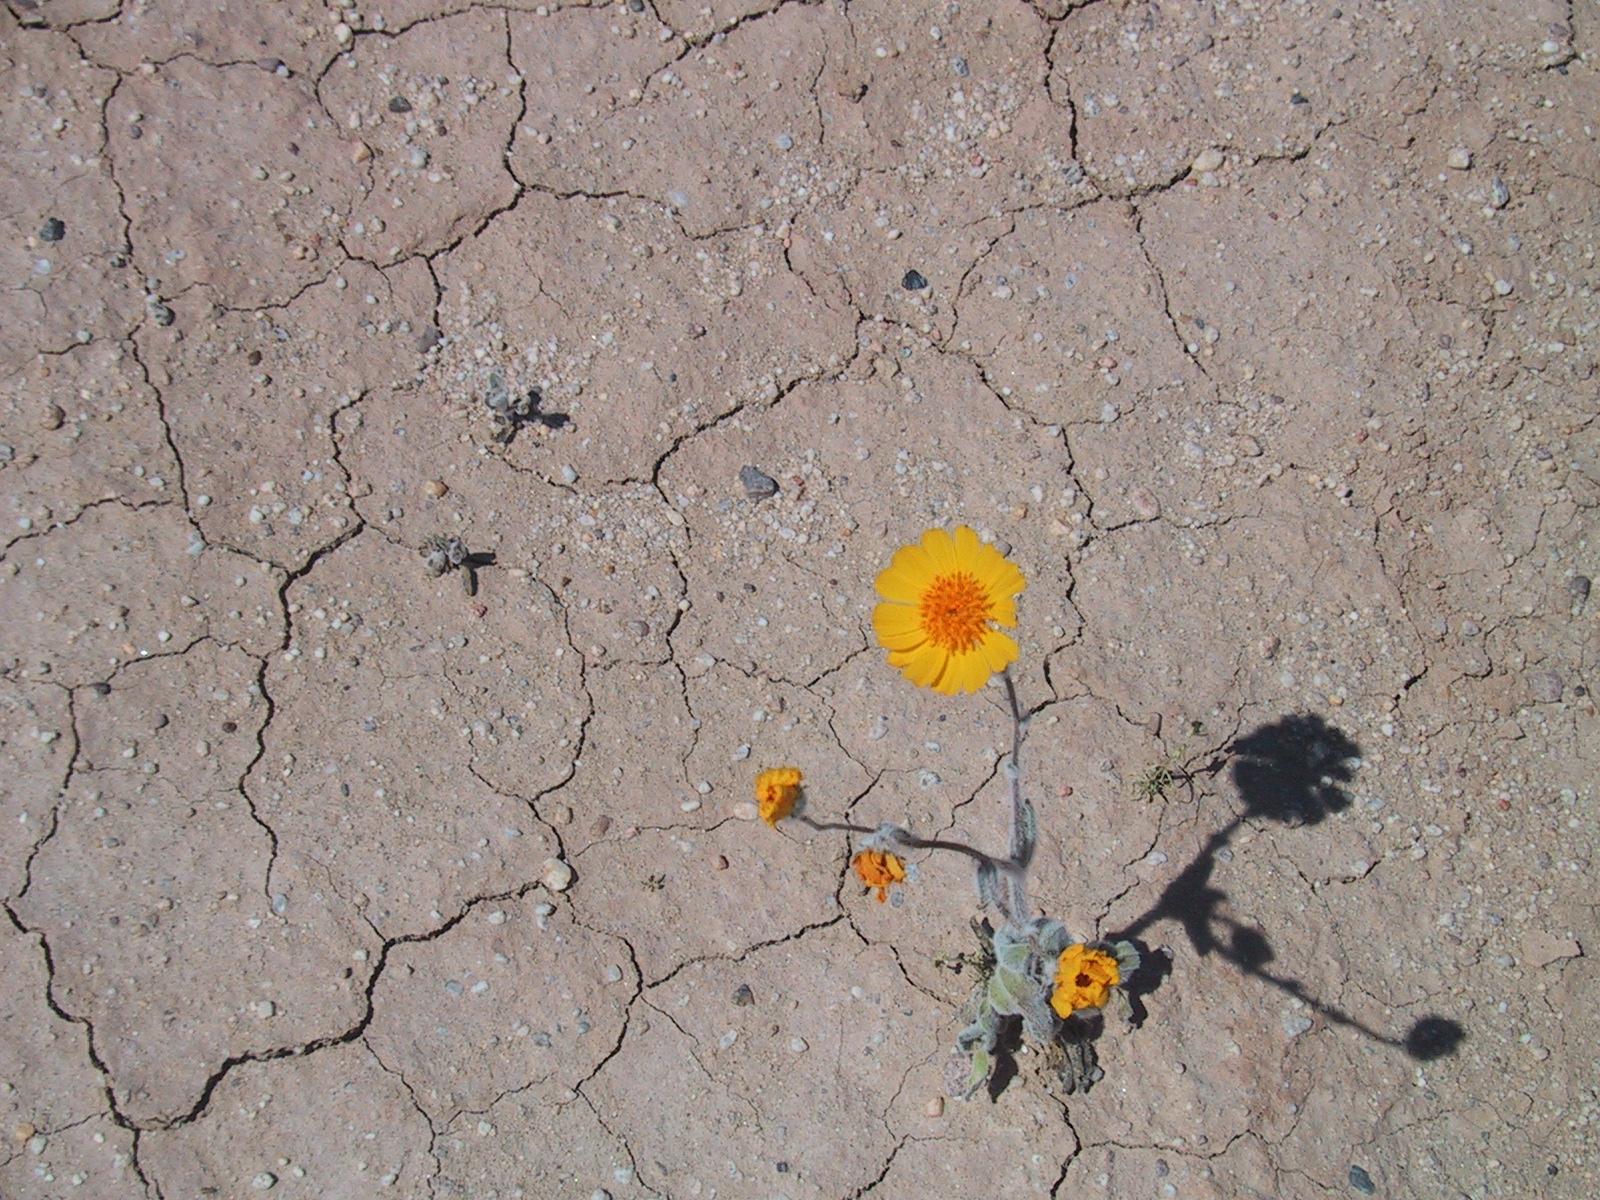 desert flower Desert flower is a 2009 german biographical film directed by sherry hormann it stars liya kebede, sally hawkins and craig parkinson.